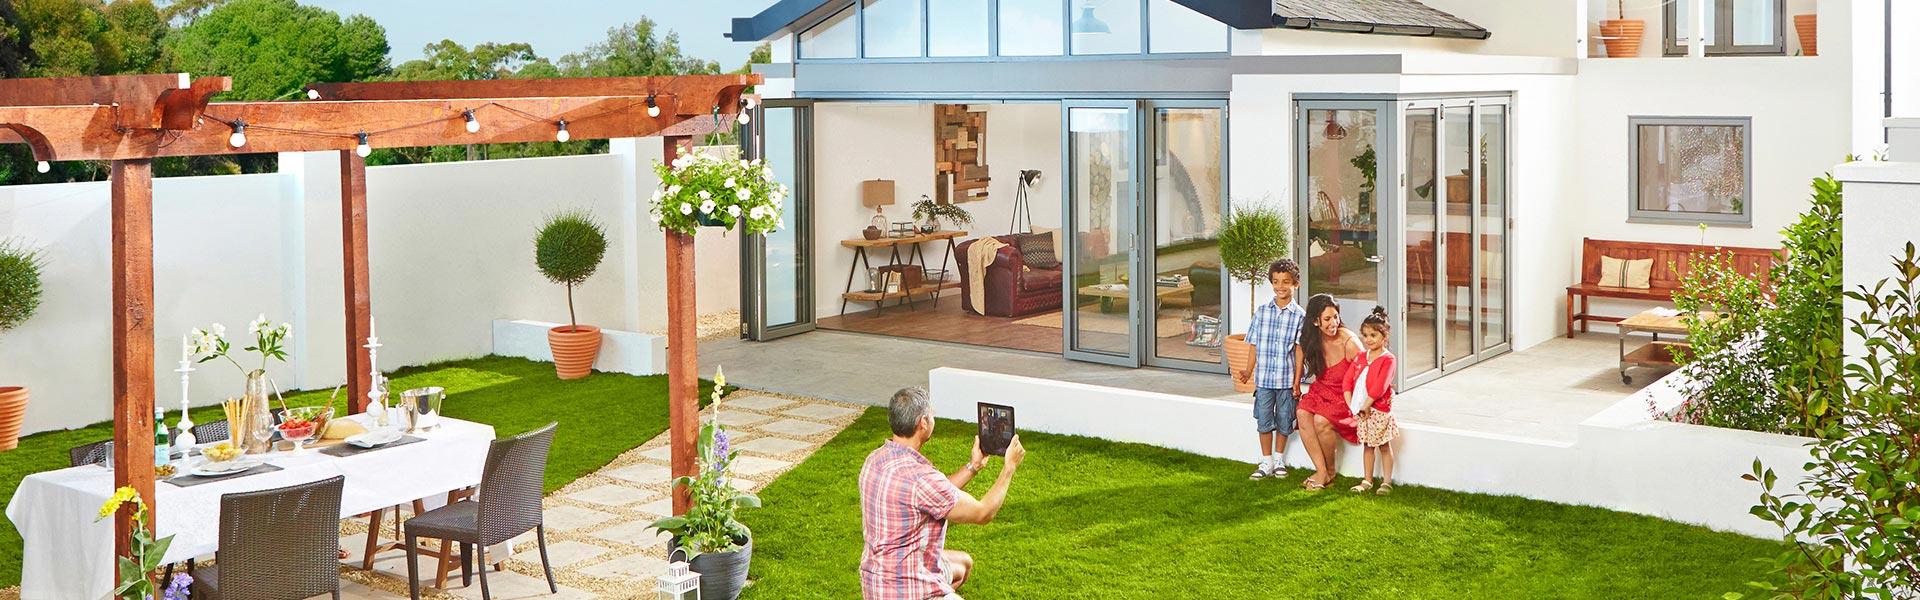 conservatory bi-fold door